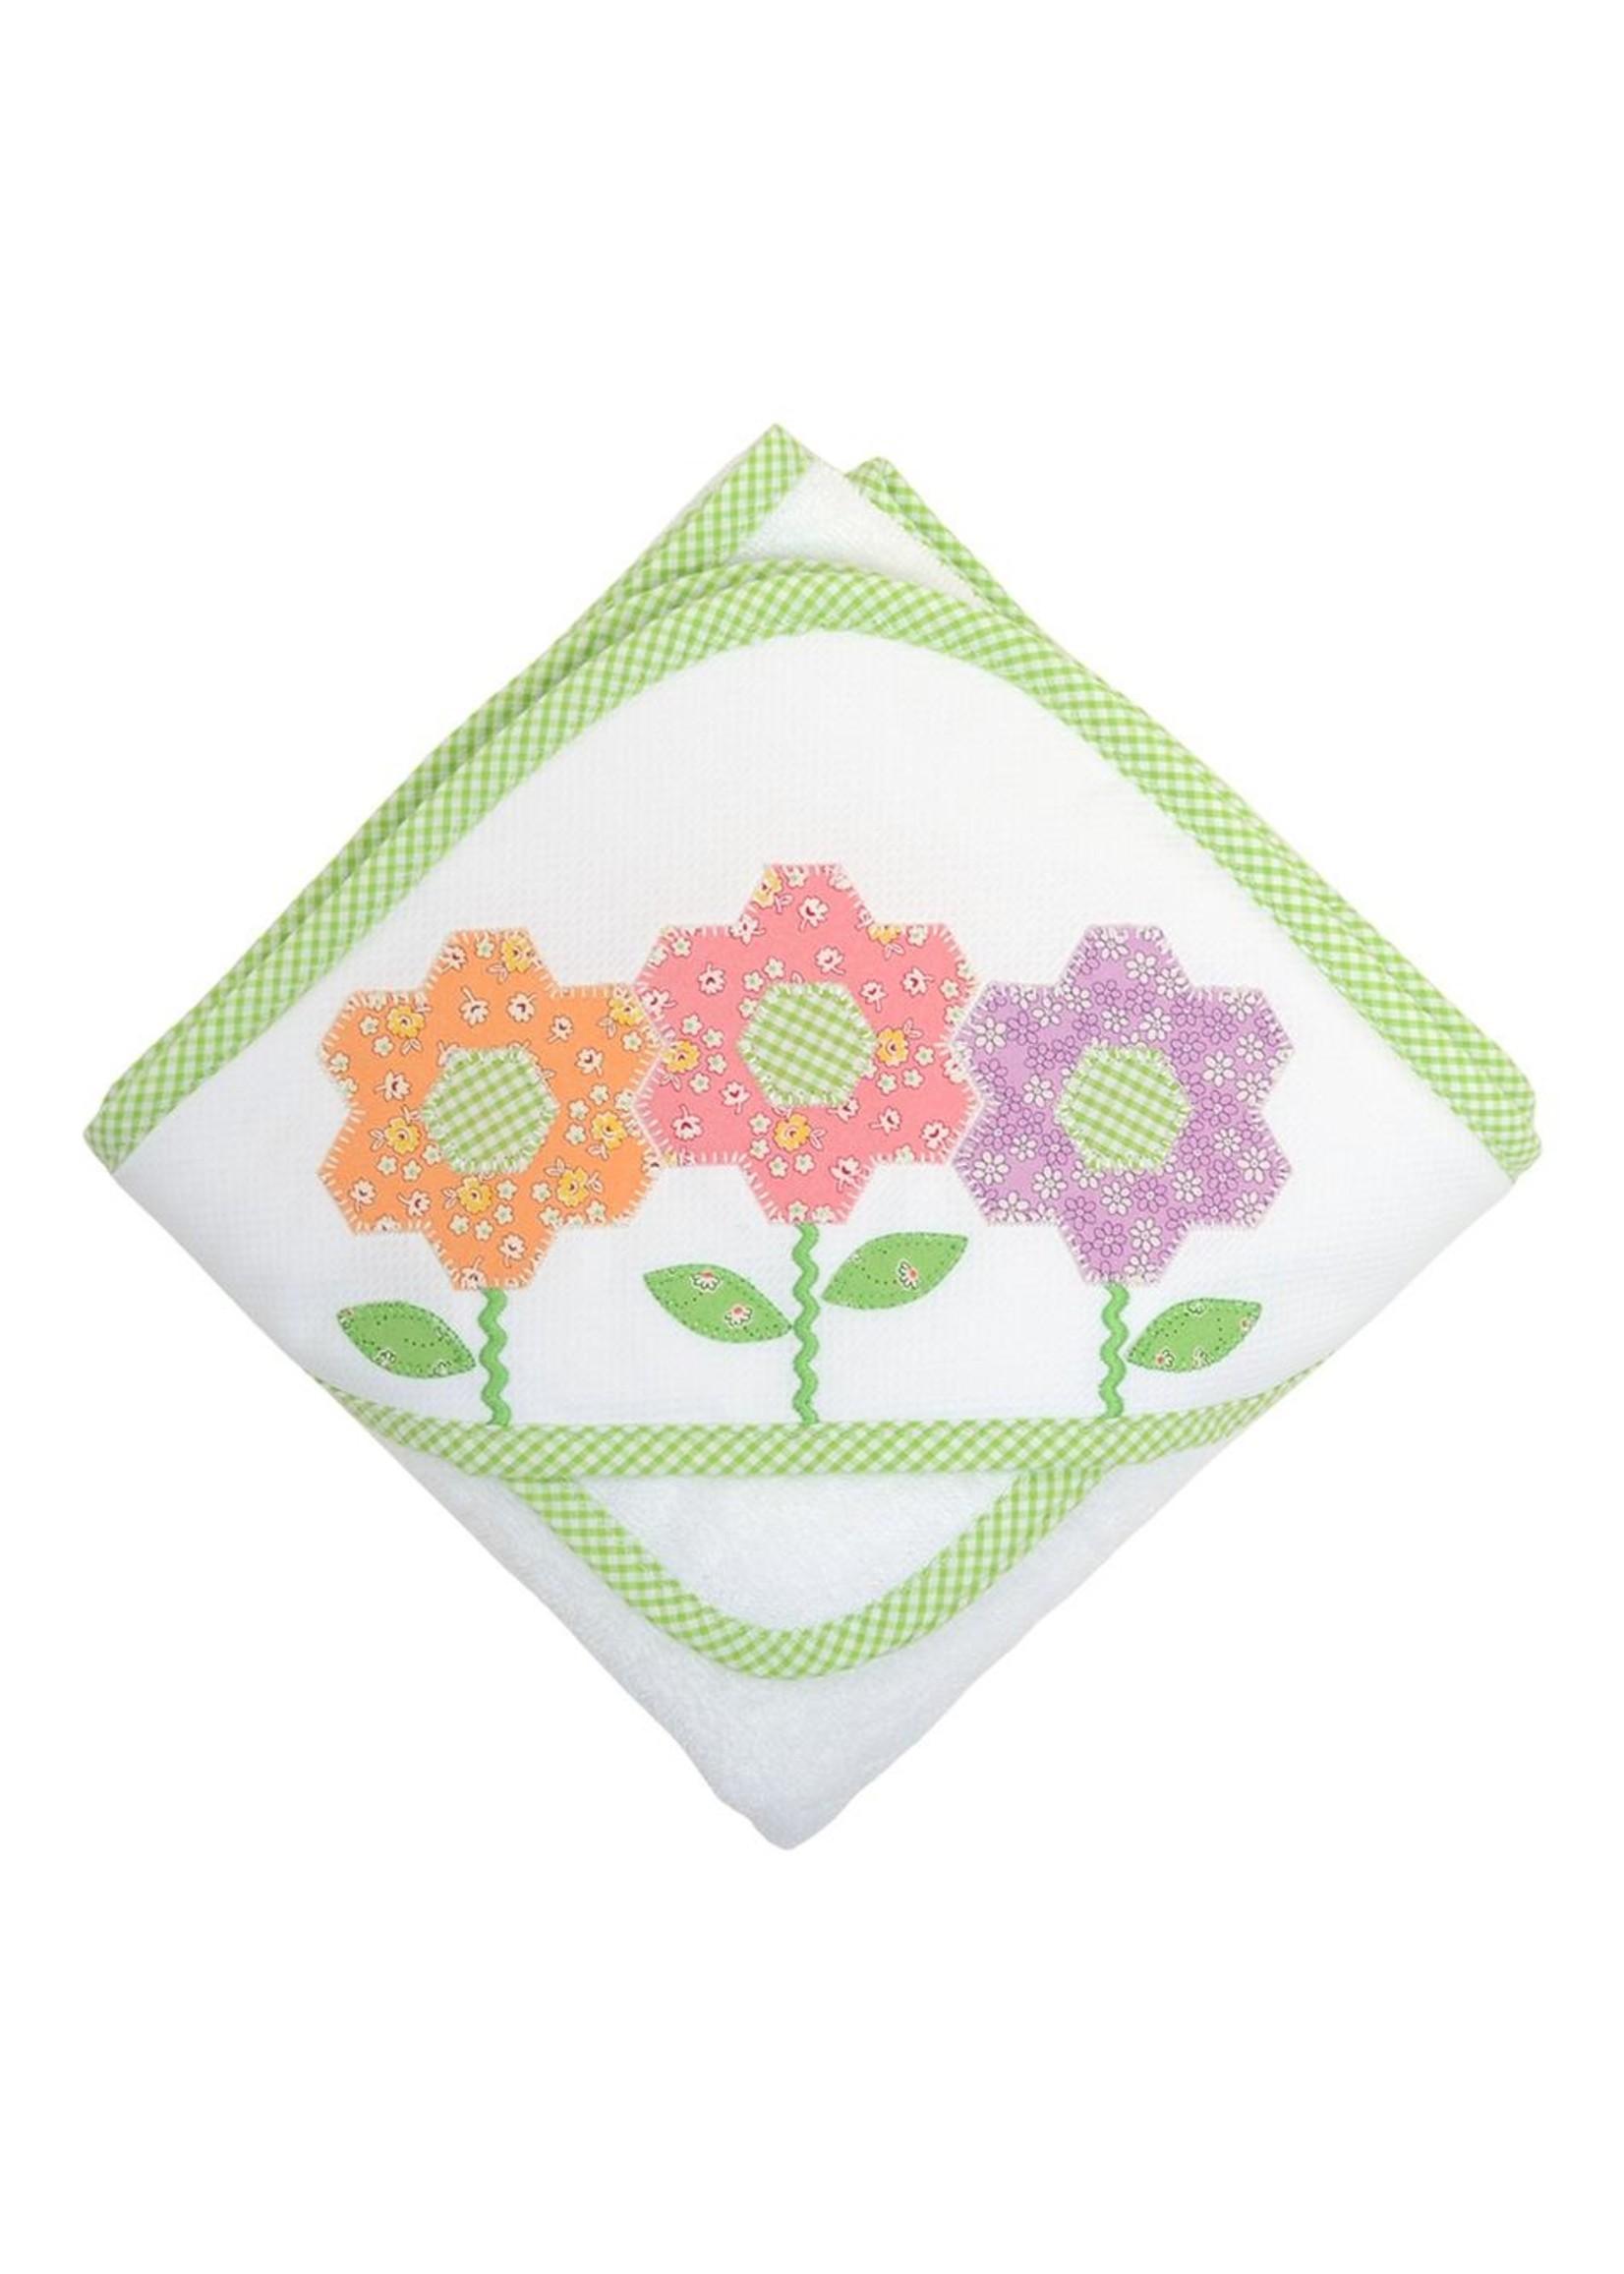 3 Marthas Rainbow Daisy Hooded Towel Set